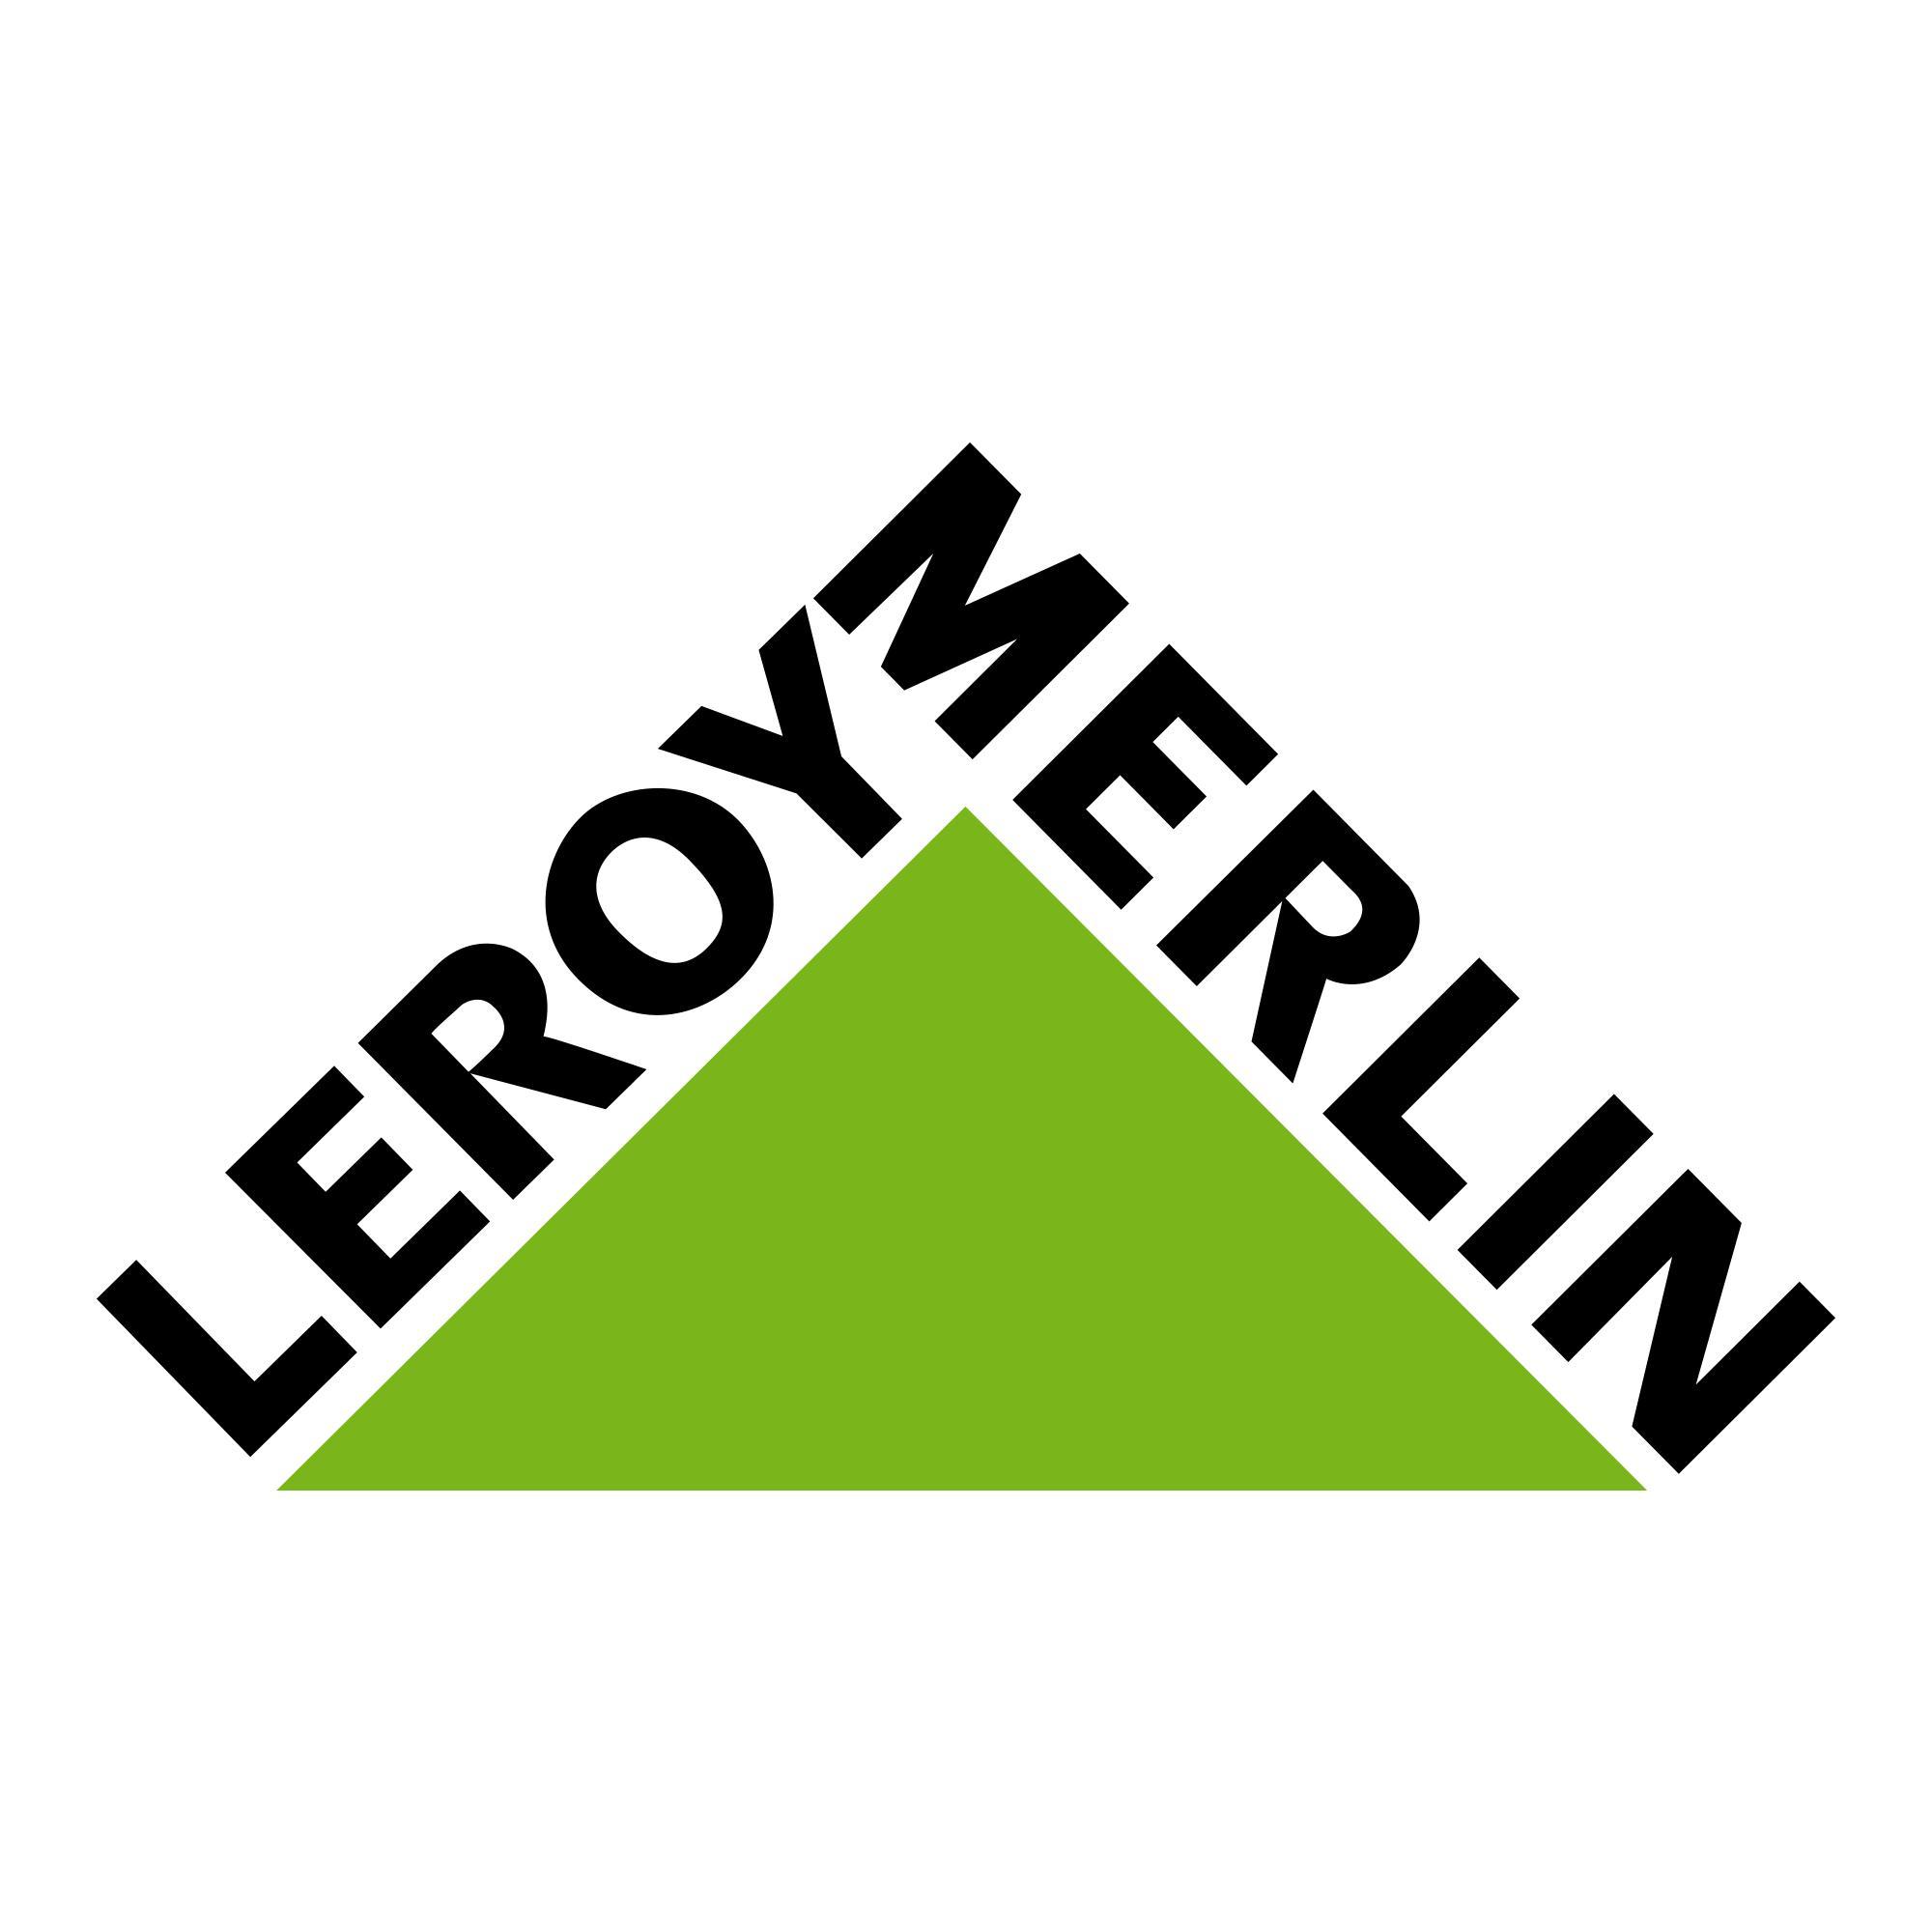 Carte de fidélité Leroy merlin - 3 ans